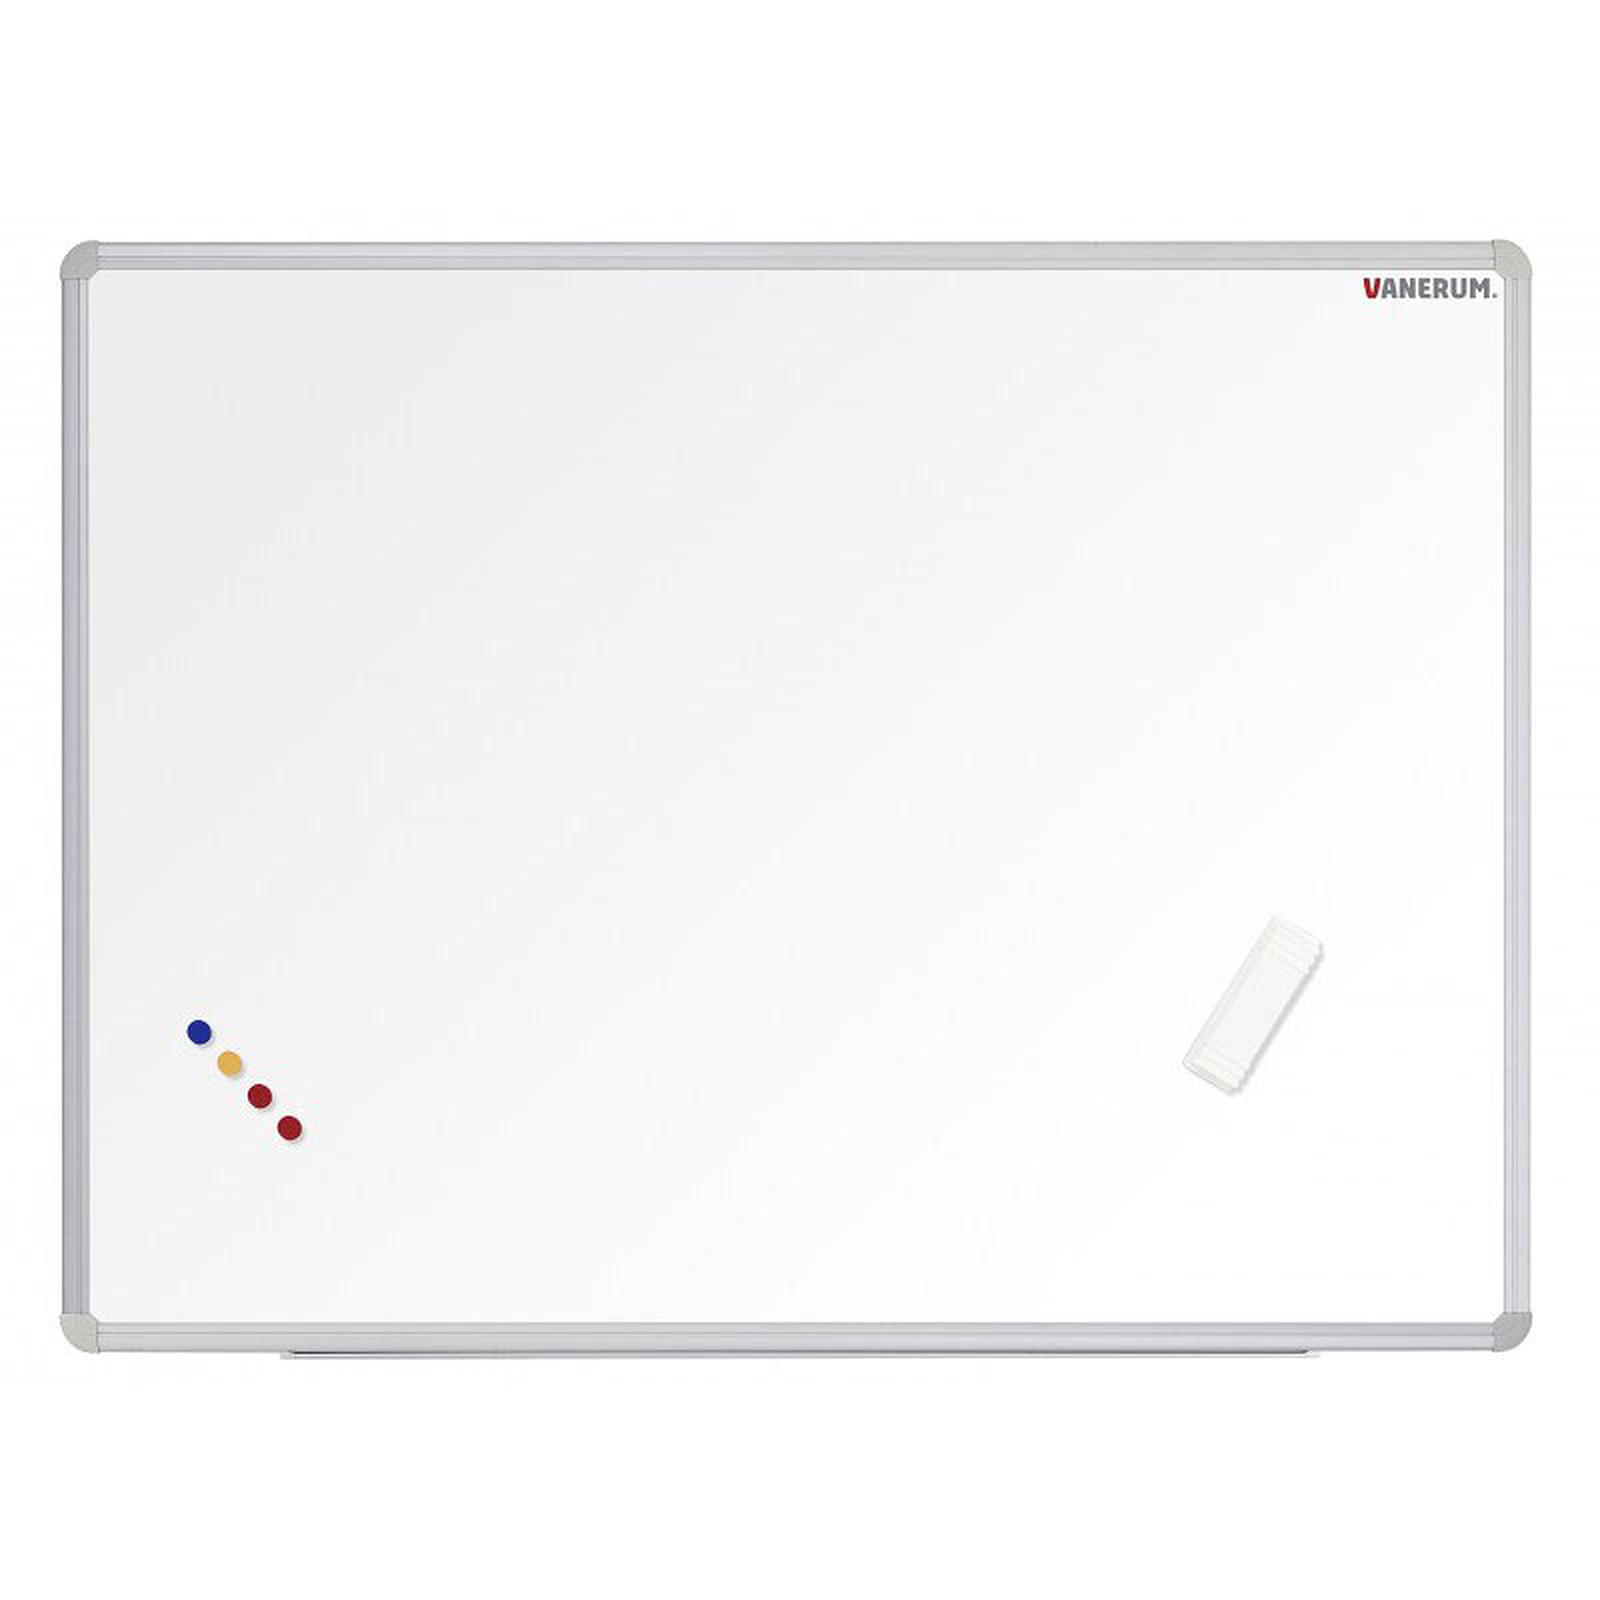 Vanerum Tableau blanc émaillé 200 x 100 cm